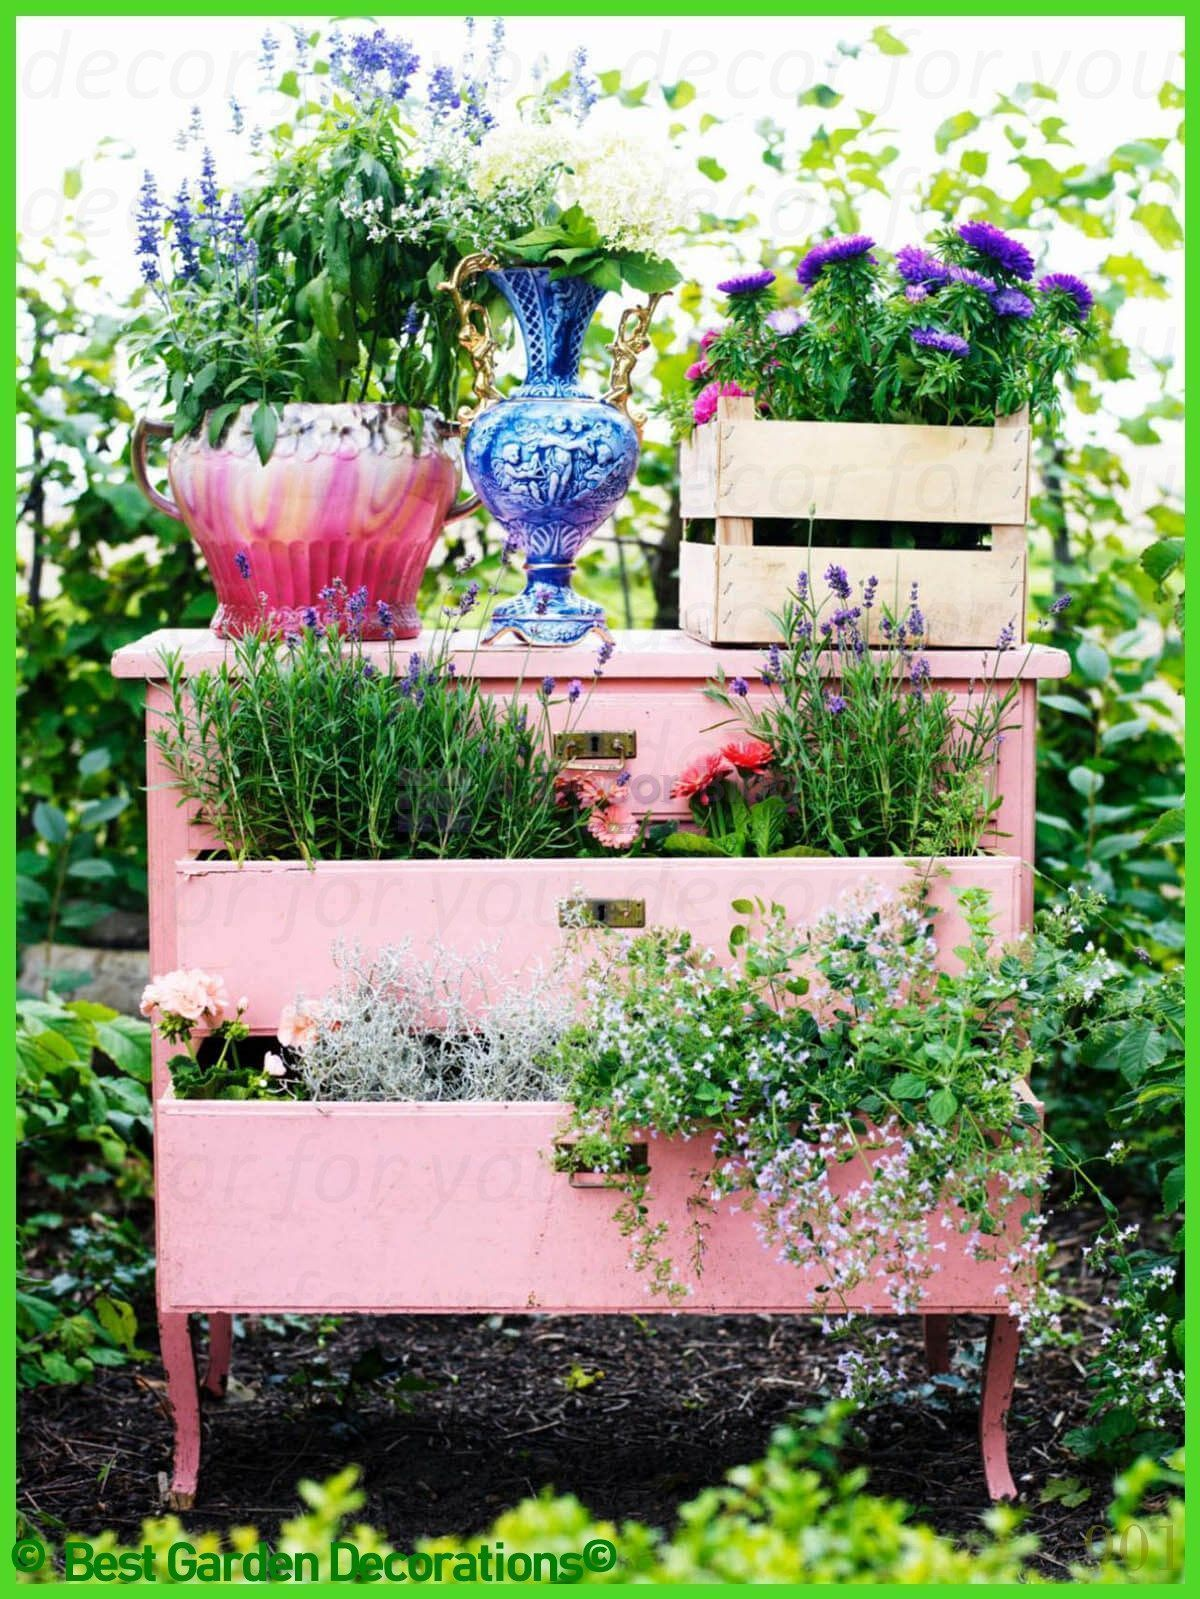 Art Gardening Inspiration Flower Garden Ideas Flower Garden Design Flower G Art Design Flower In 2020 Vintage Garden Decor Upcycled Planter Upcycle Garden